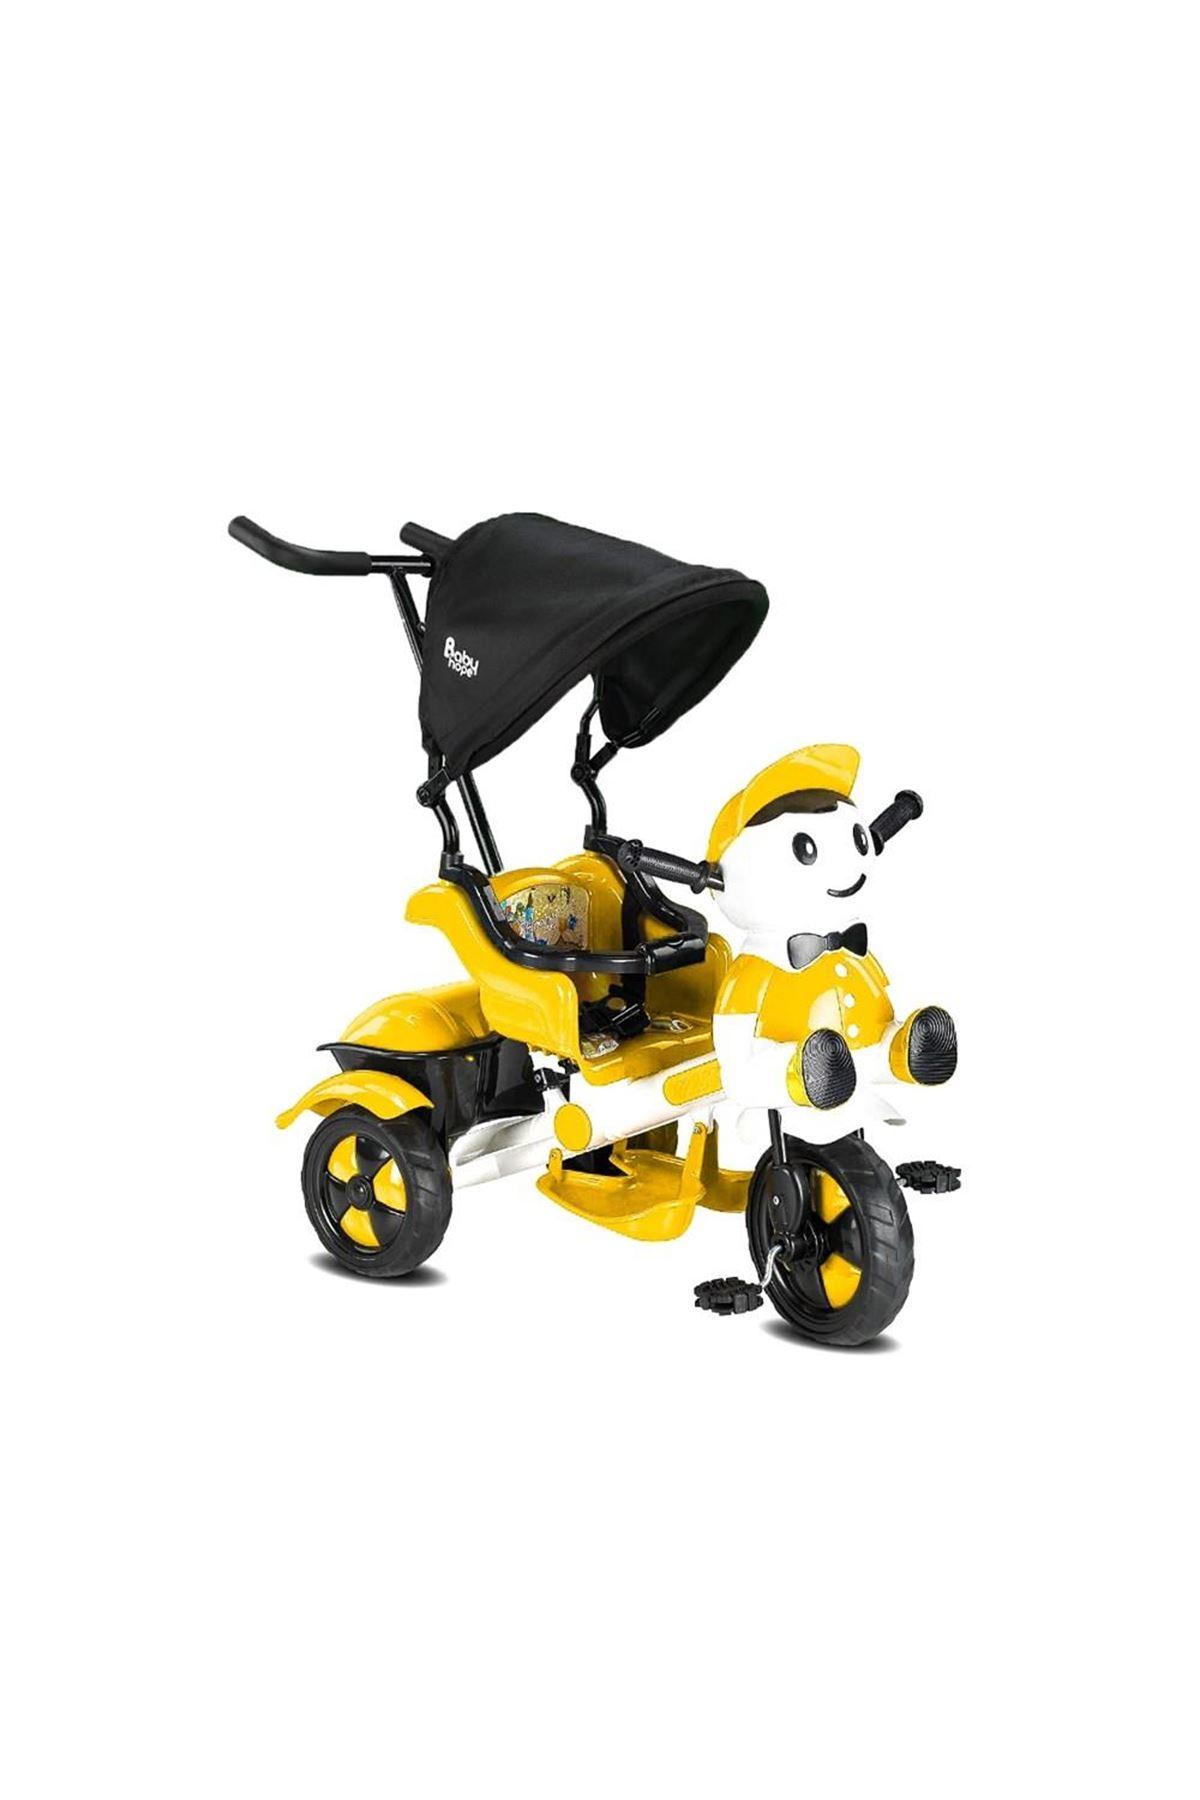 Babyhope 125 Yupi Triycle 3 Tekerli Kontrollü Bisiklet Sarı